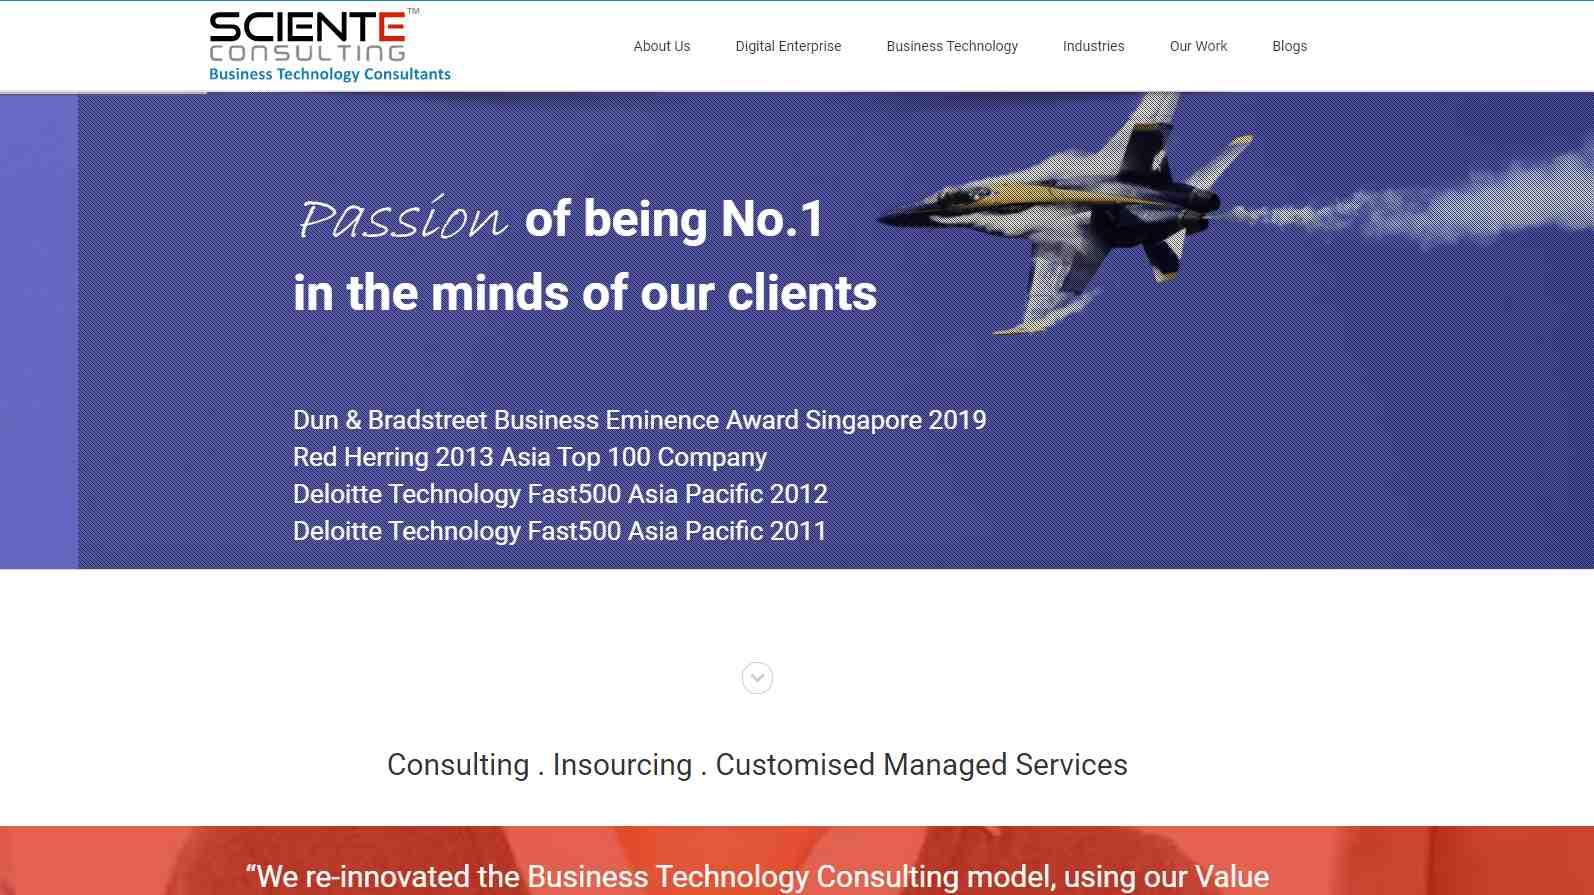 sciente Top Salesforce Consultants in Singapore